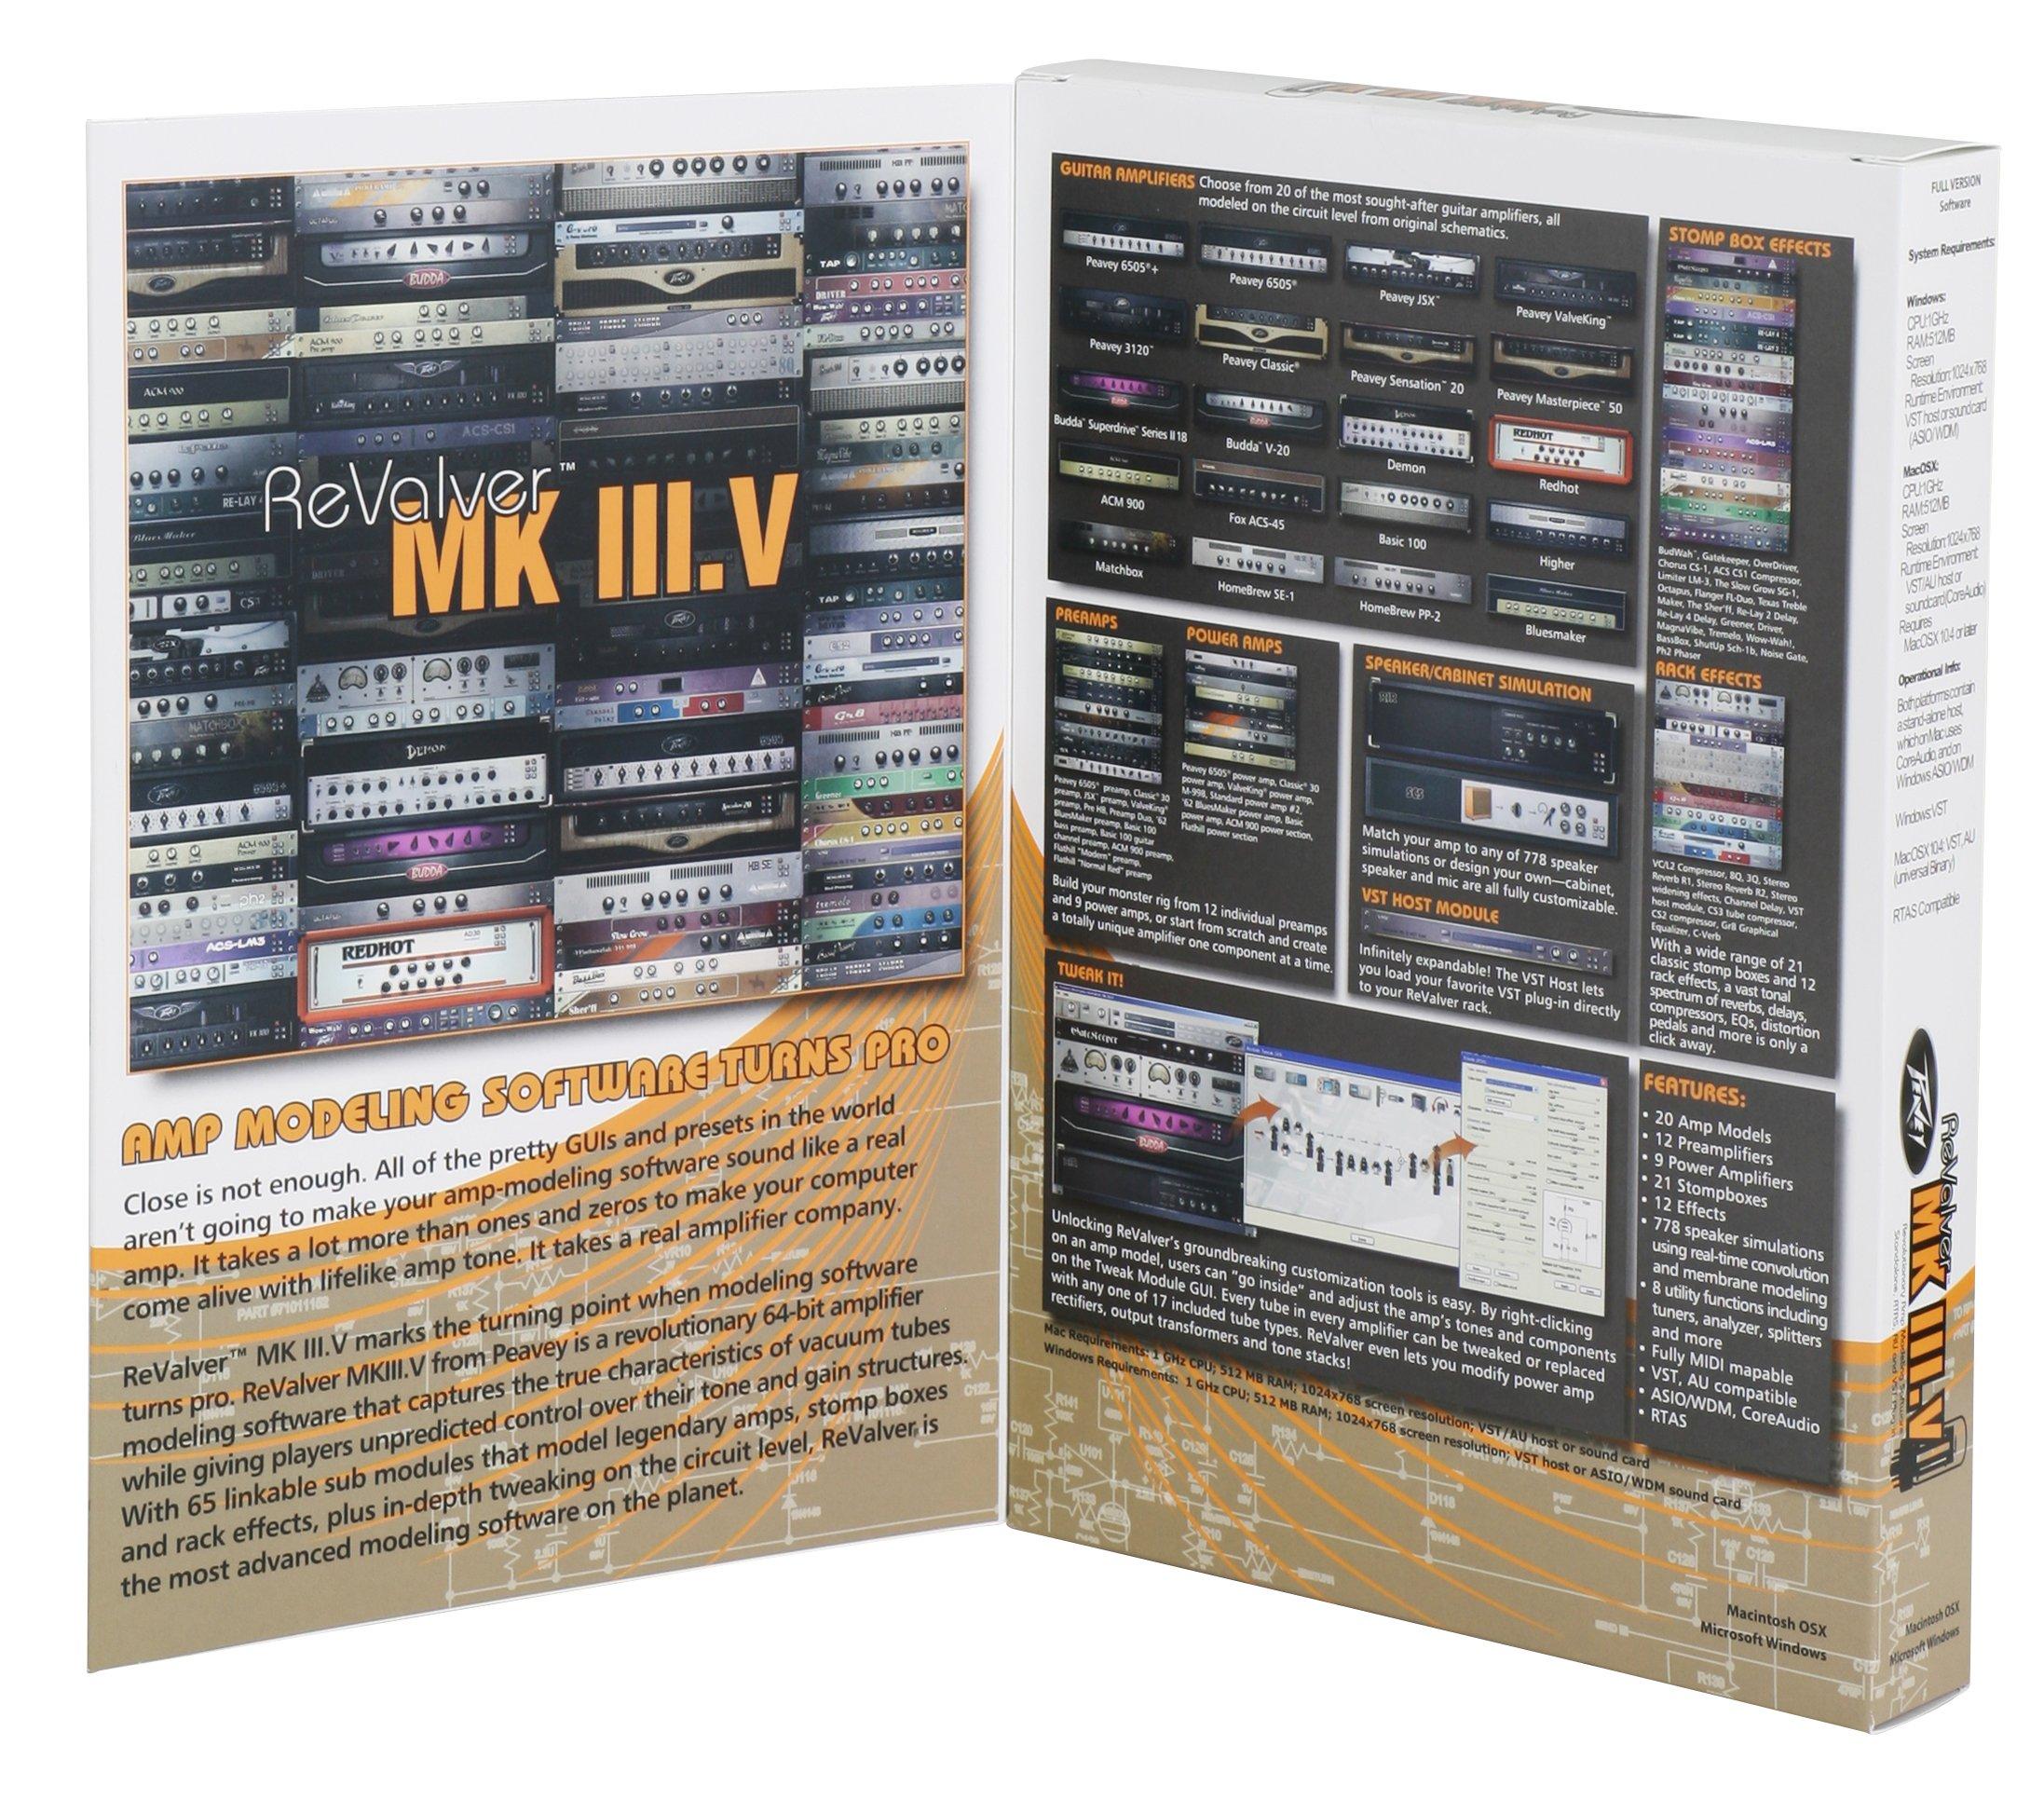 Peavey ReValver MK III Amp Modleing Software by Peavey